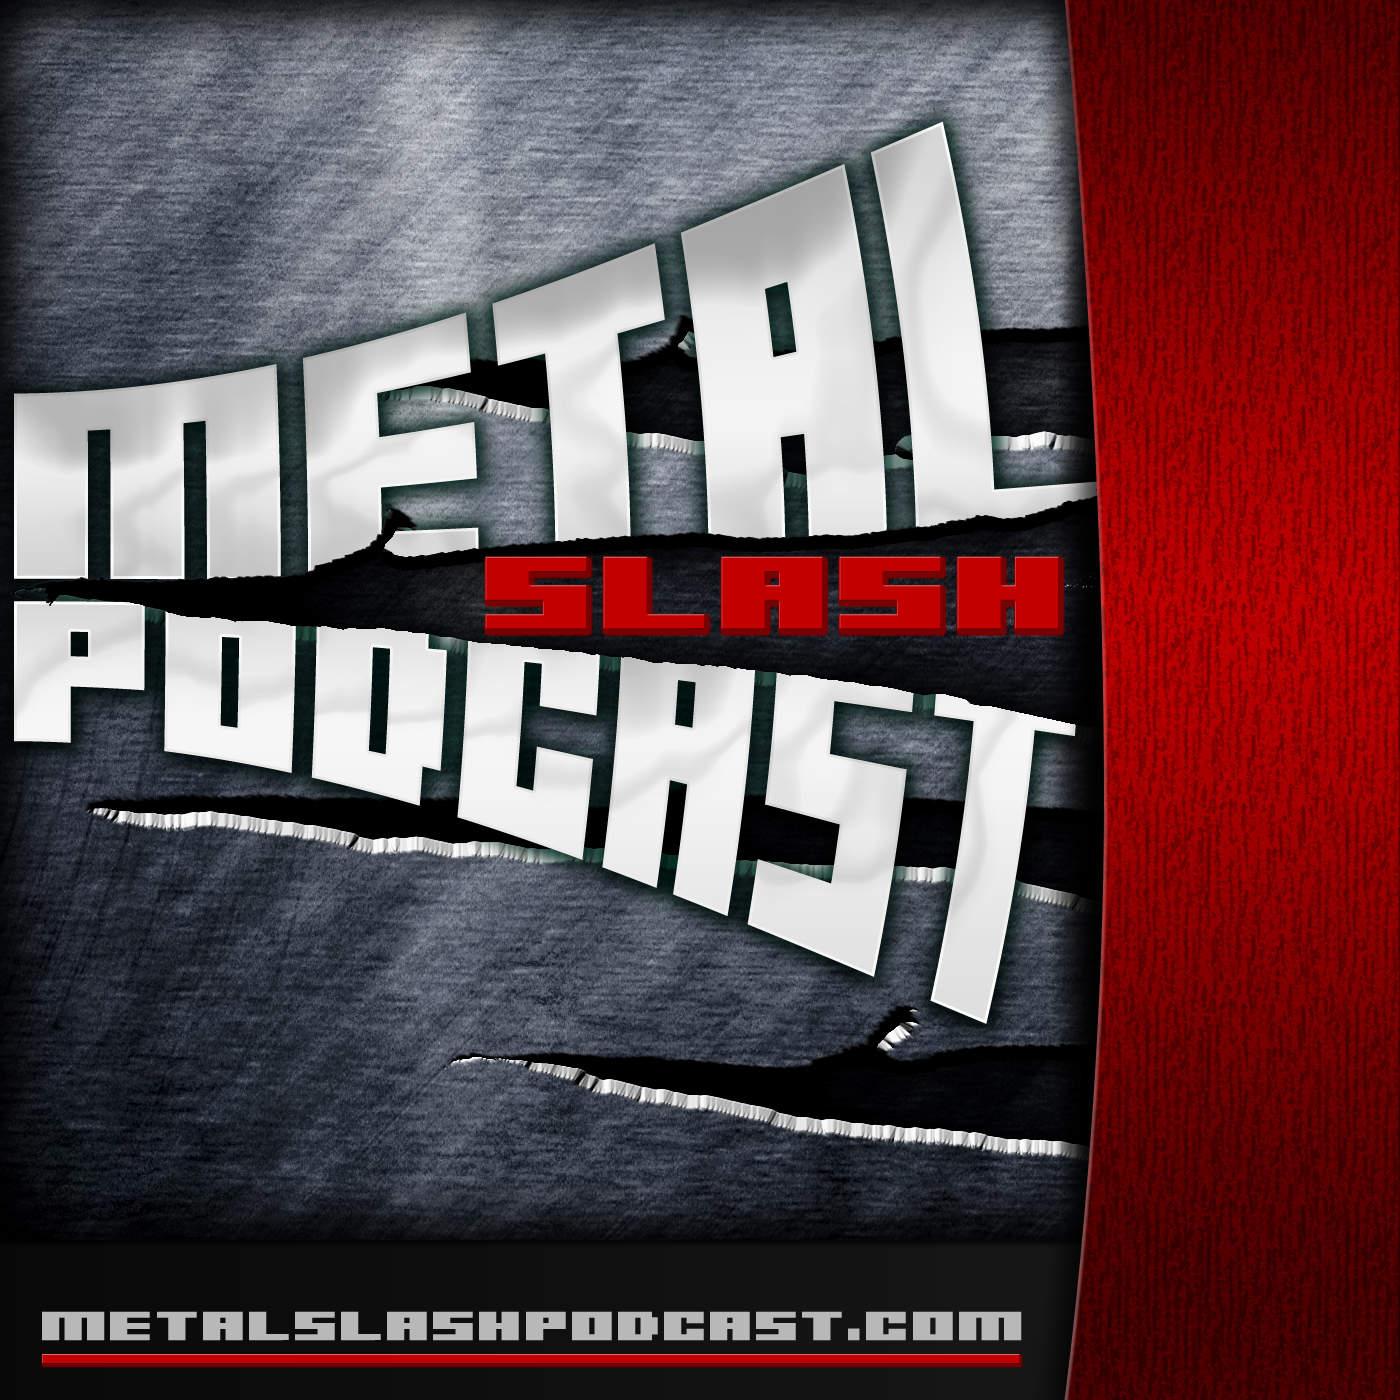 Metal Slash Podcast